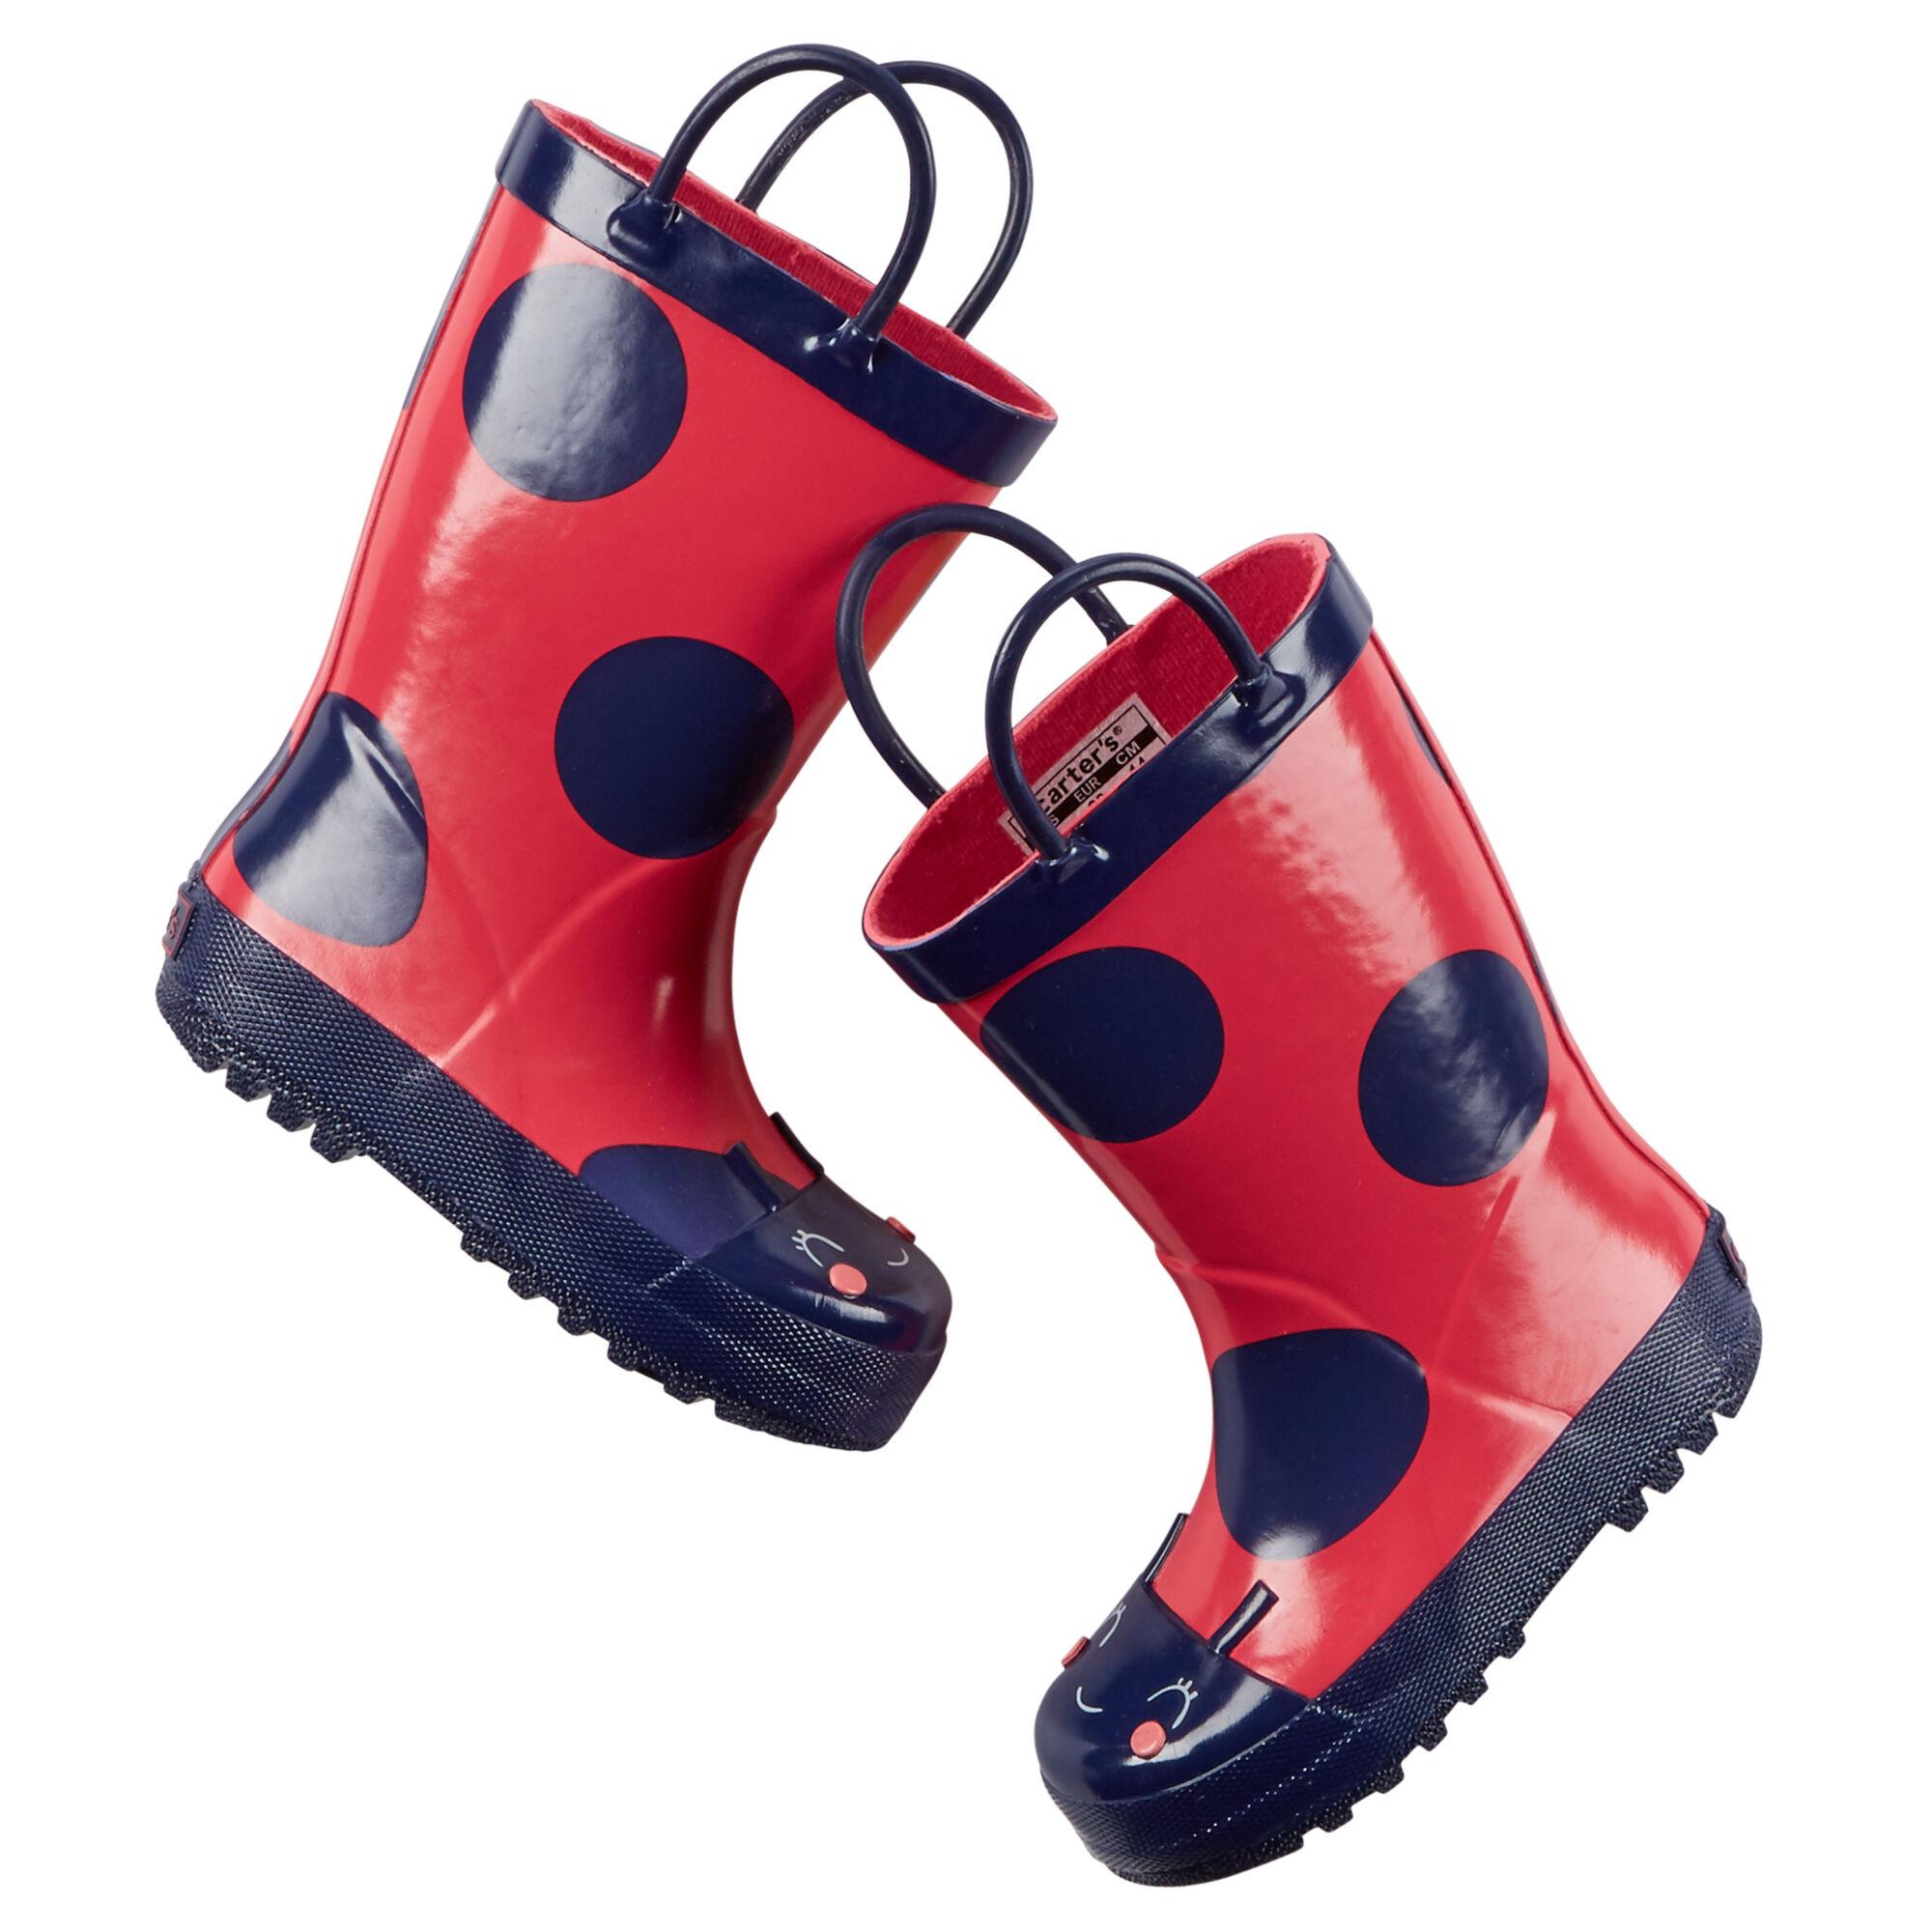 Carter's Ladybug Rain Boots | Carters.com